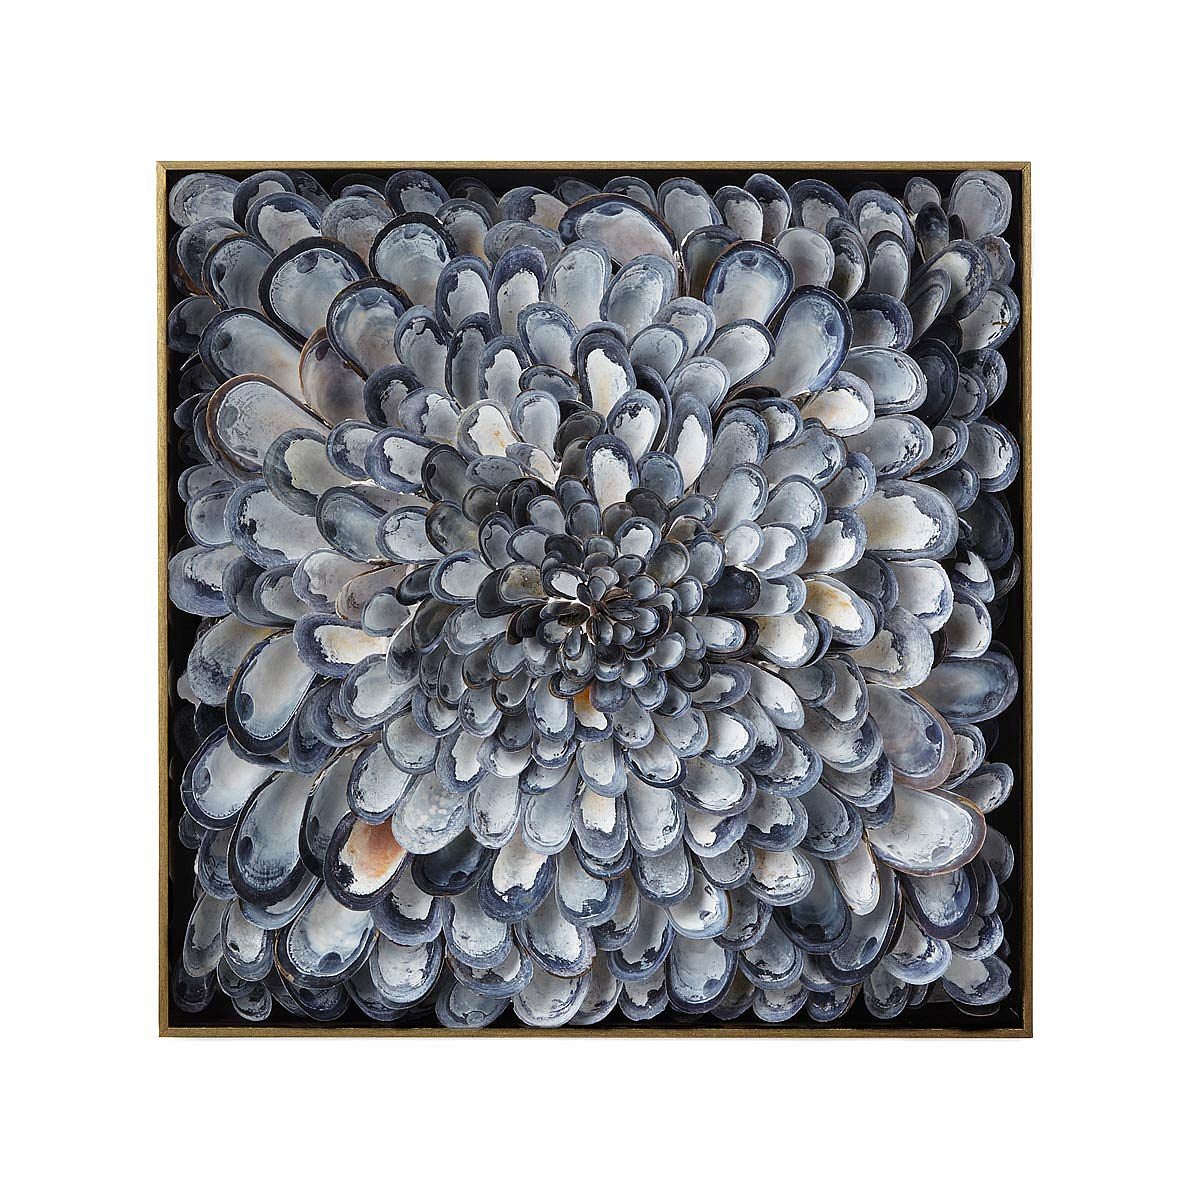 Infinite Mussels Wall Sculpture | shell art | UncommonGoods